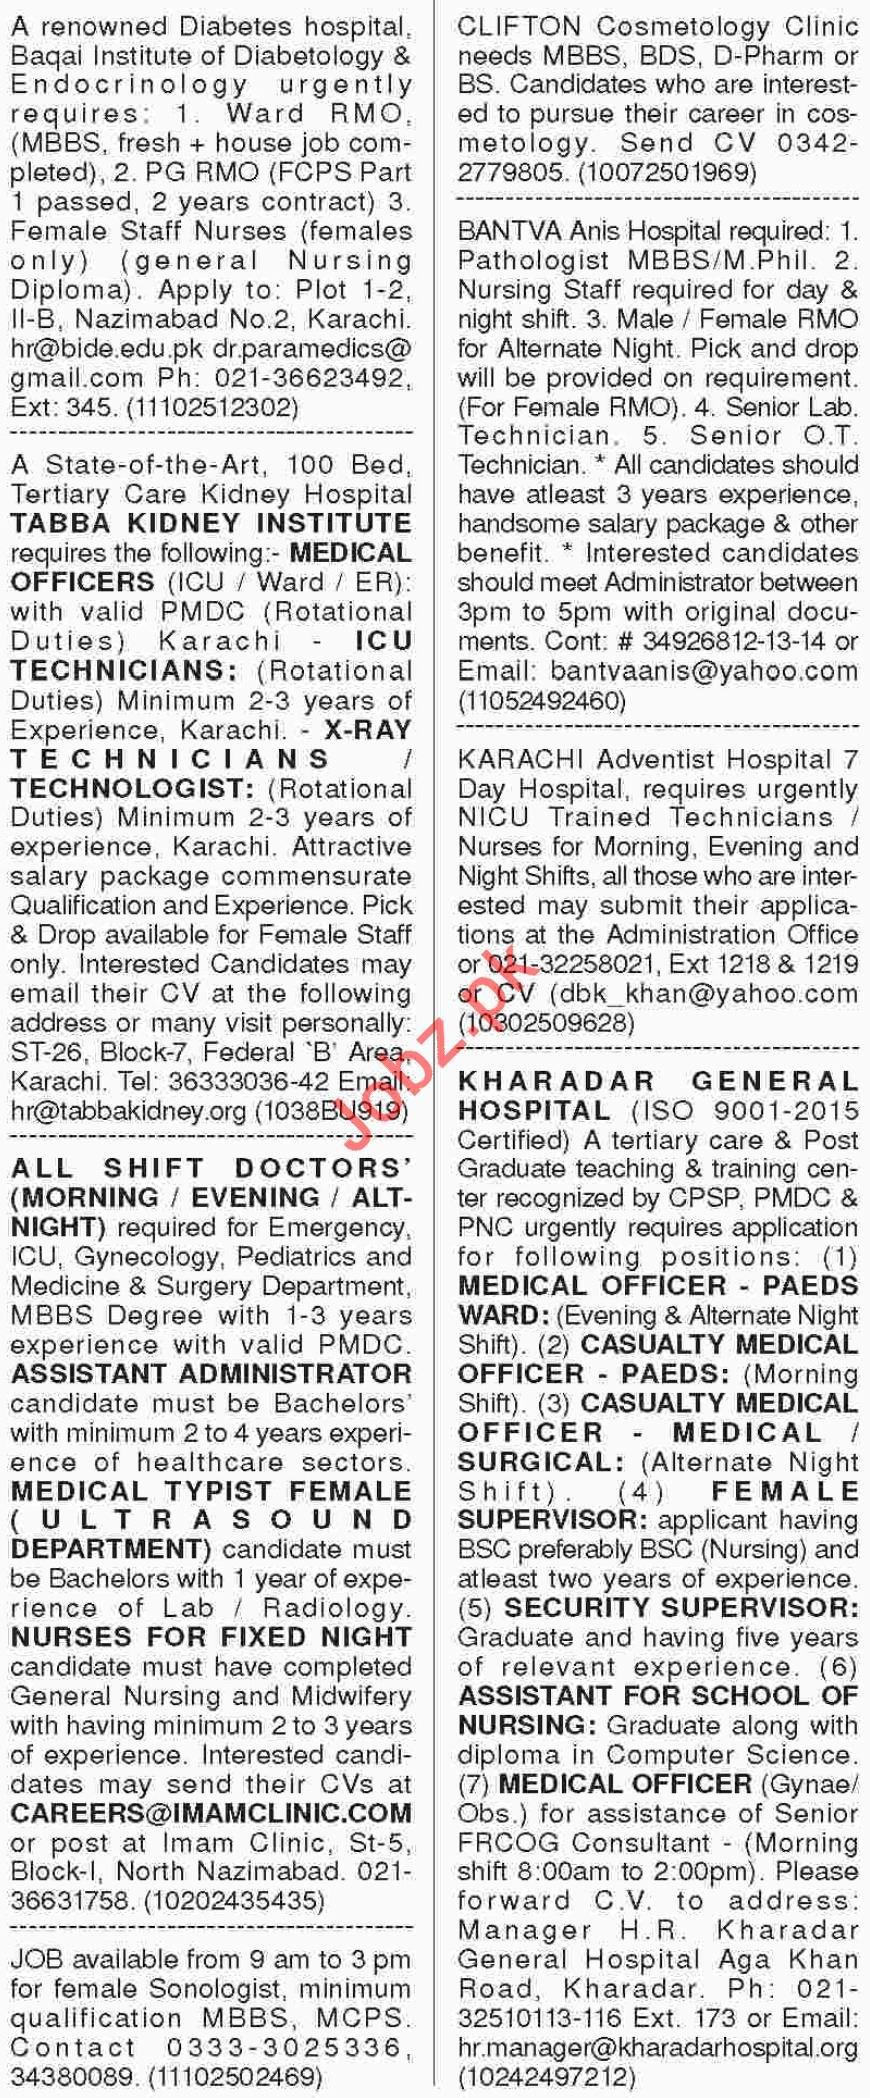 Dawn Sunday Newspaper Classified Medical Jobs 2018